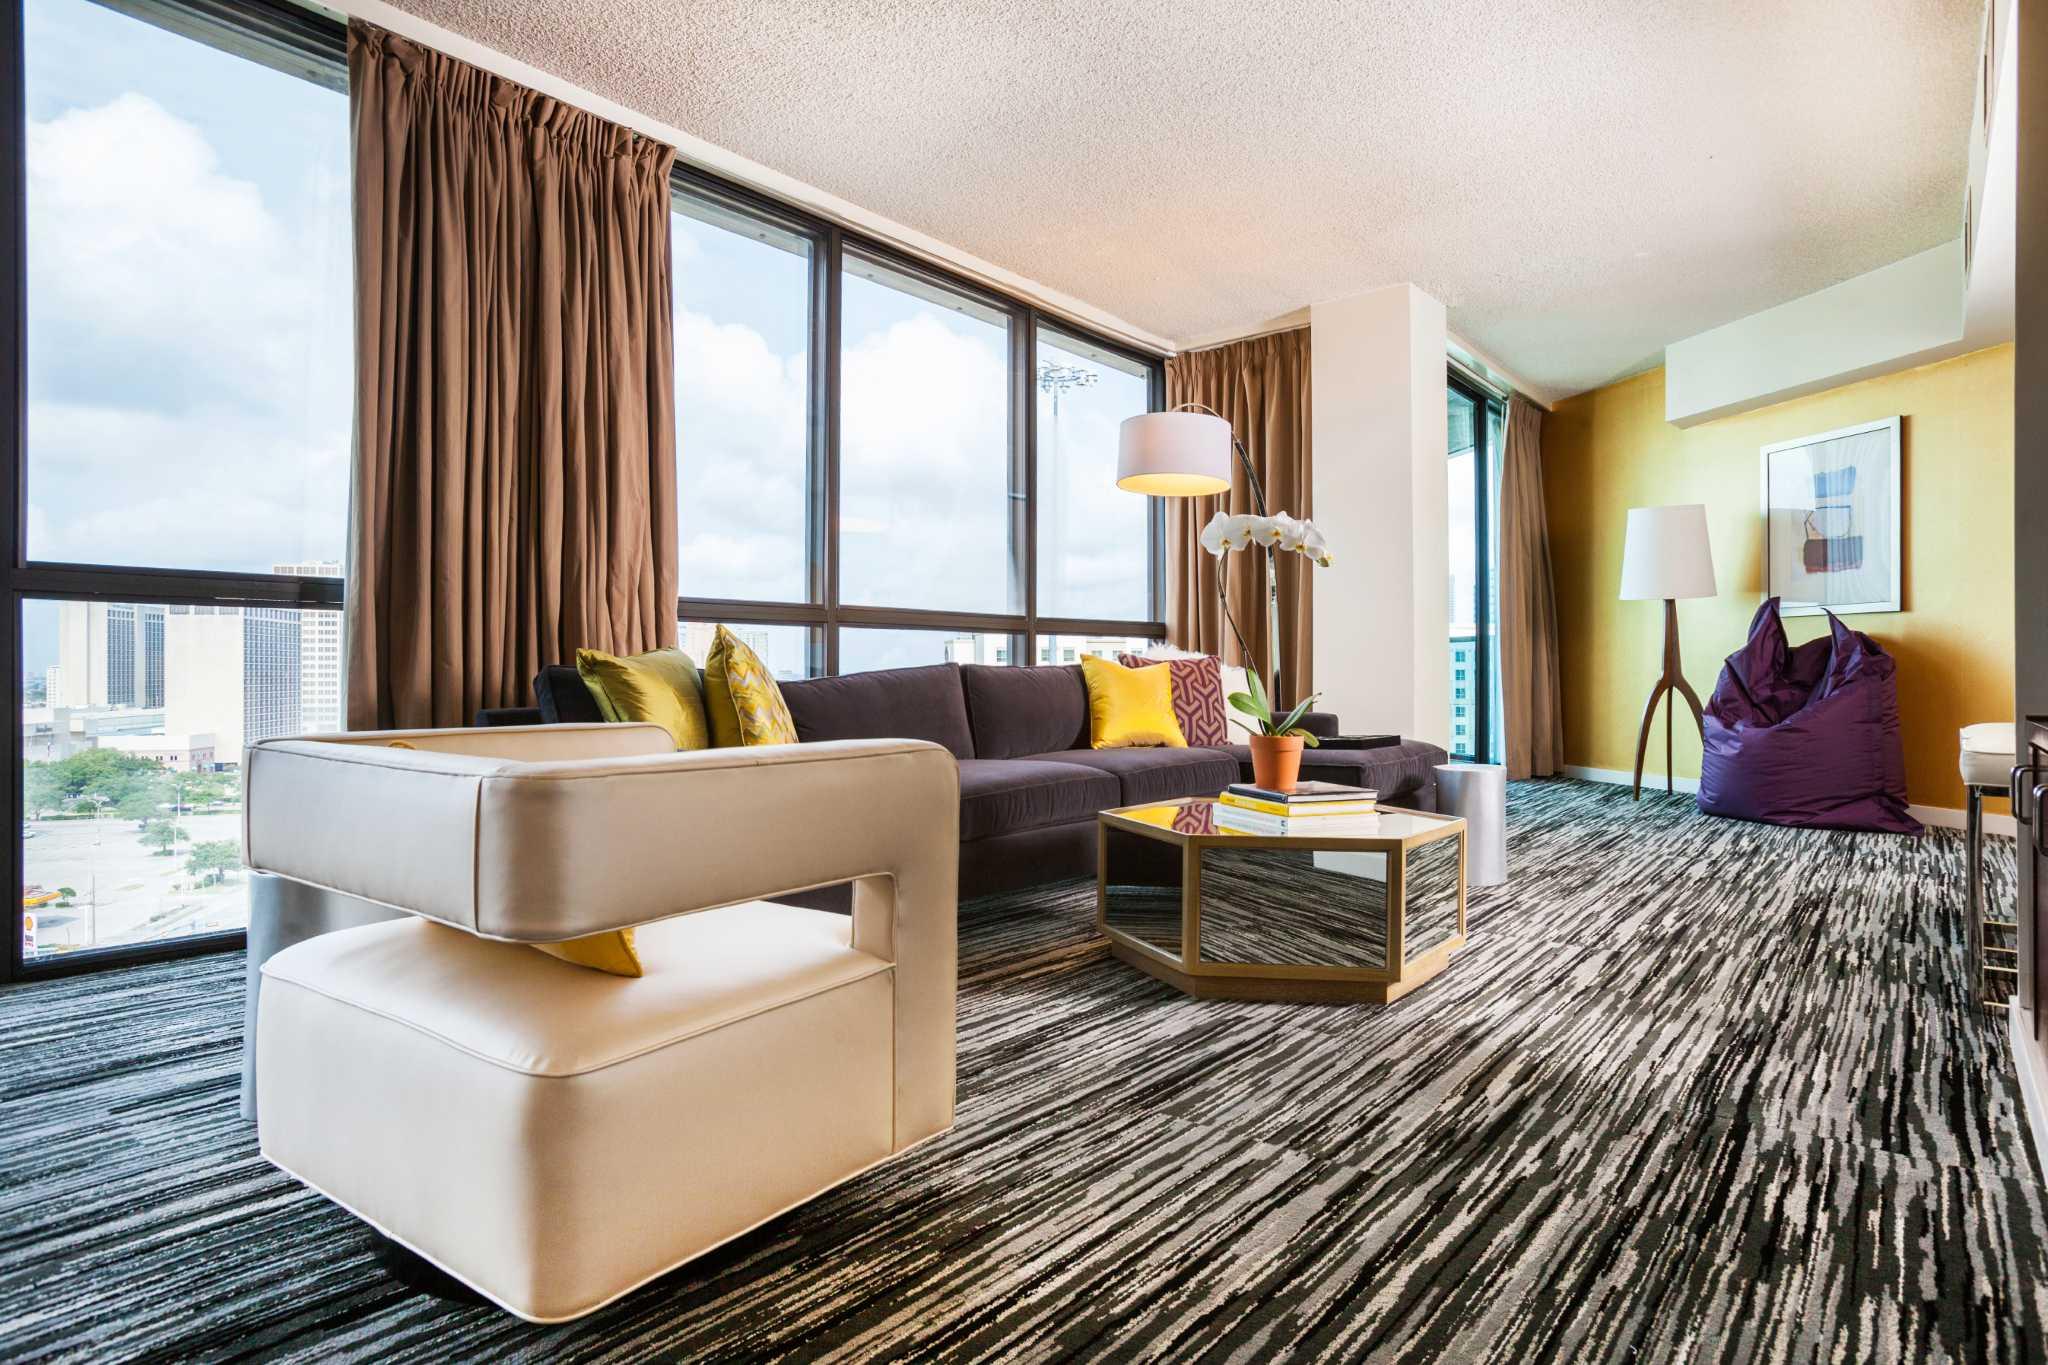 Cheap Hotels Near Galleria In Houston